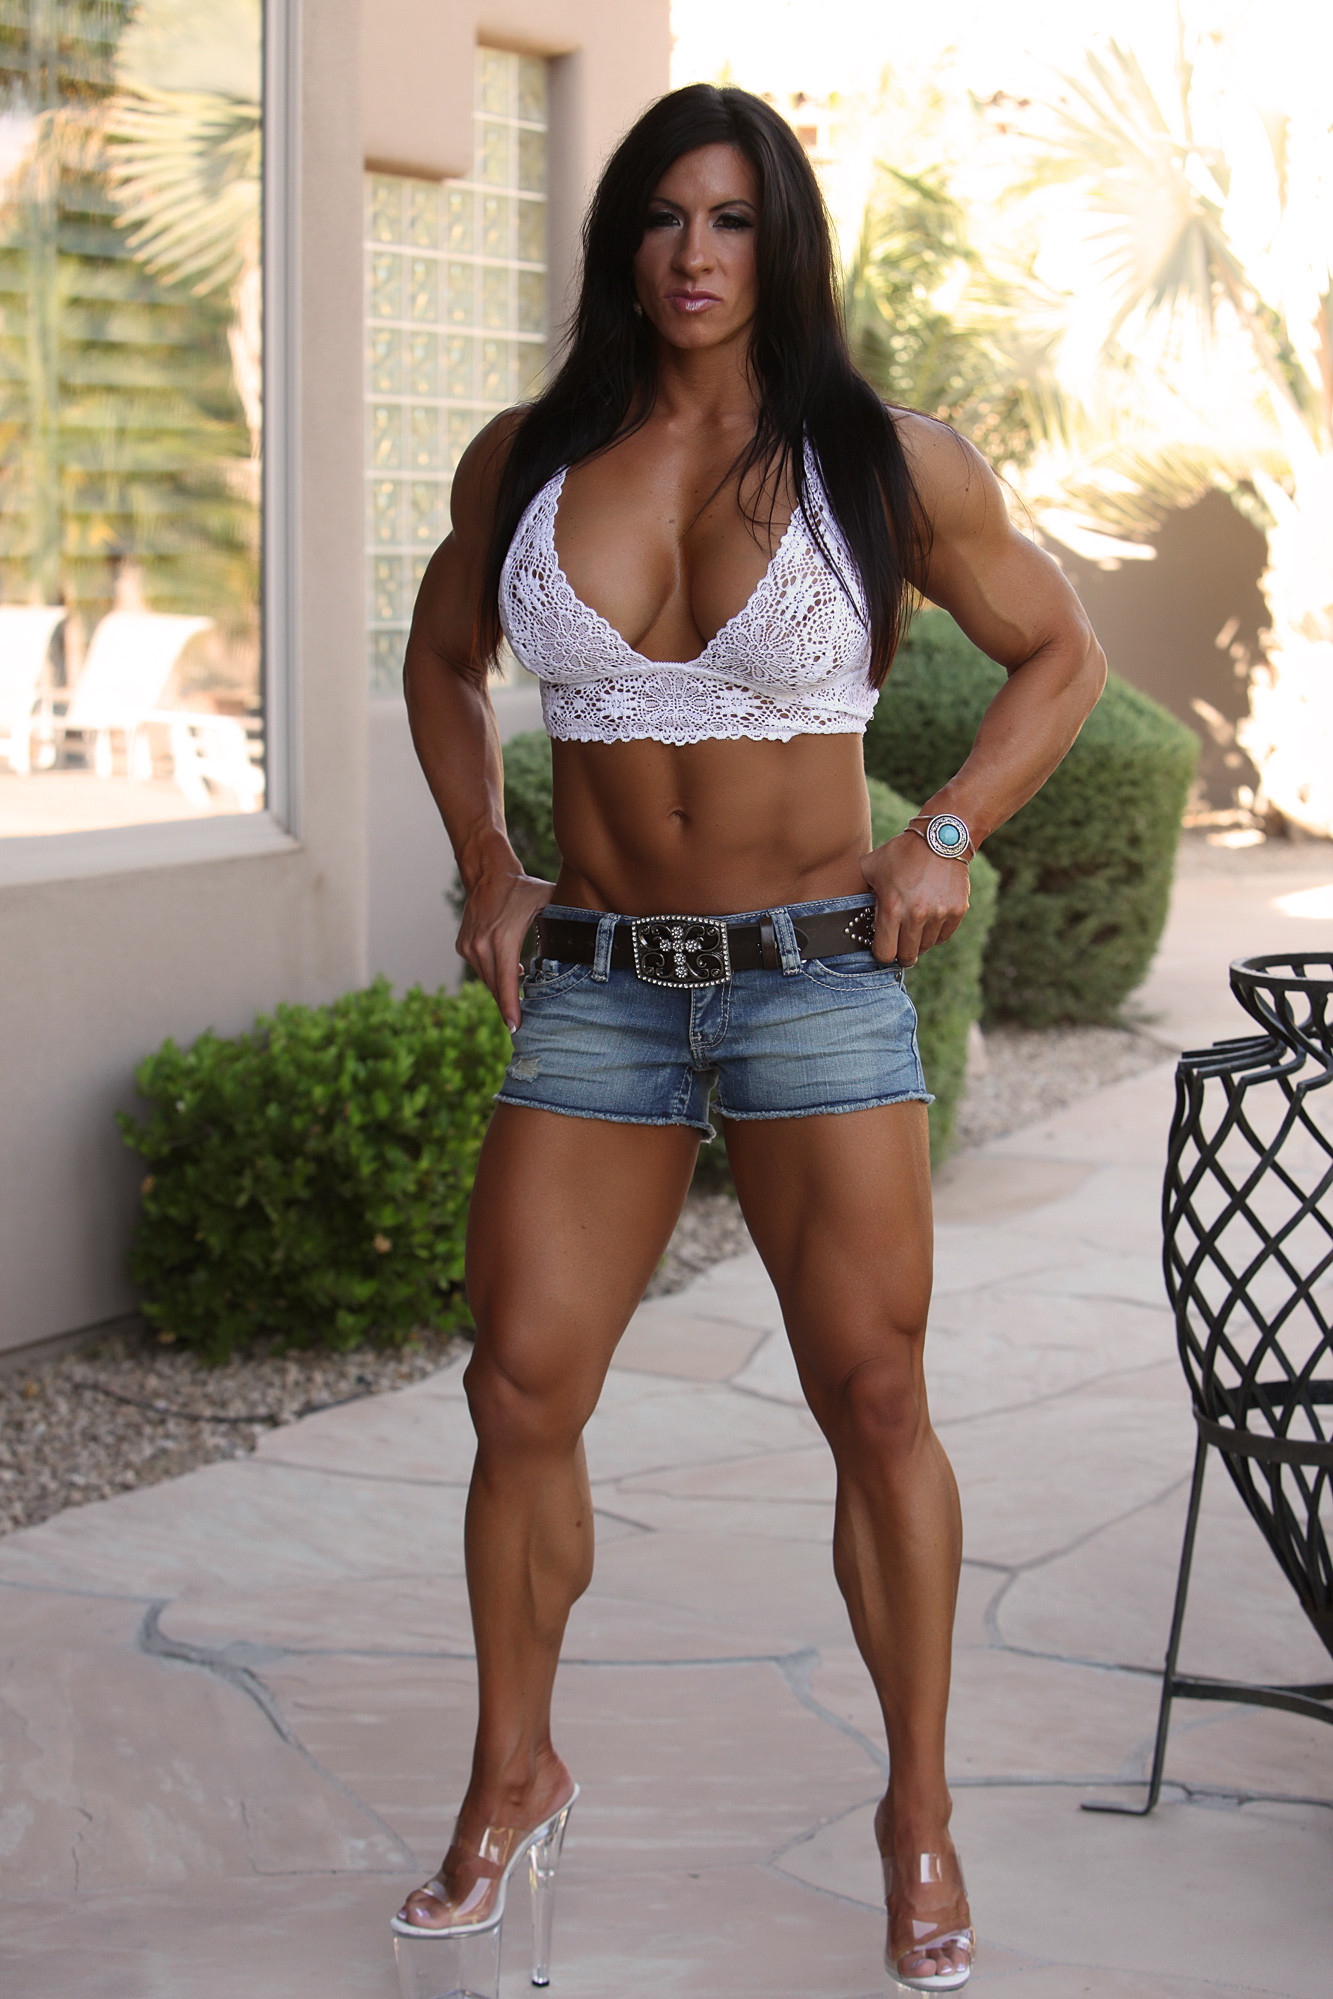 Angela Salvagno Twitter angela salvagno wiki & bio - sportswoman, adult model